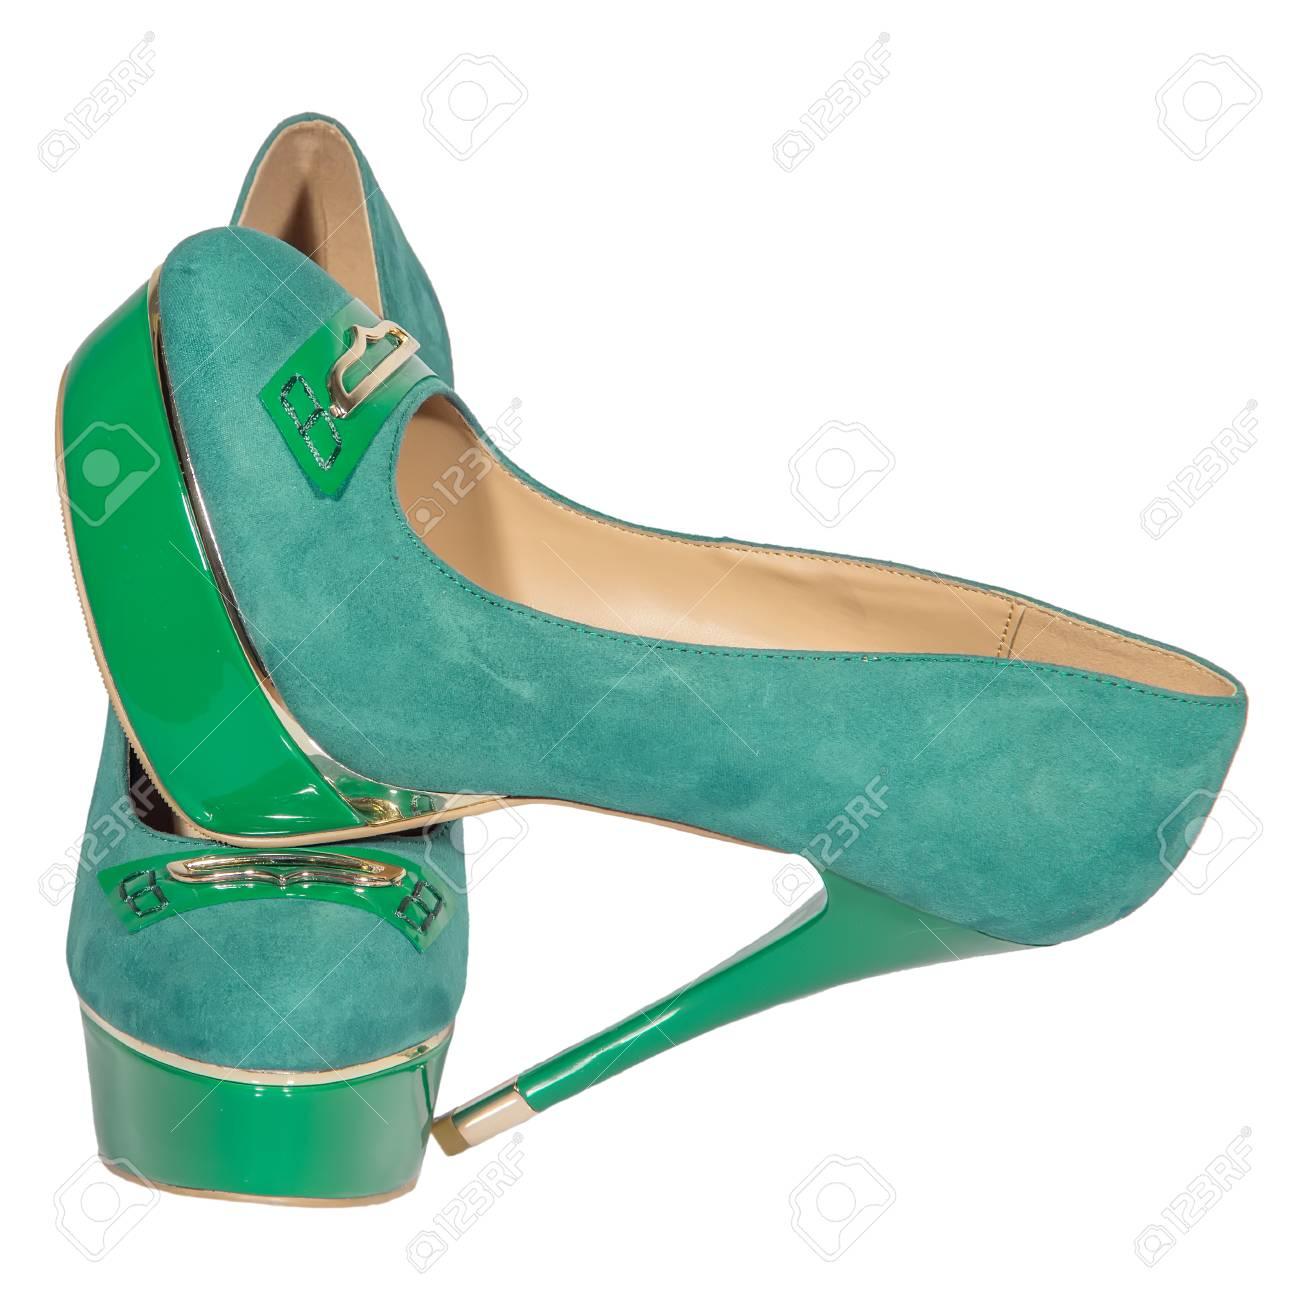 aea003d0f434 Zapatos de tacón alto para mujer verde aislado fondo blanco